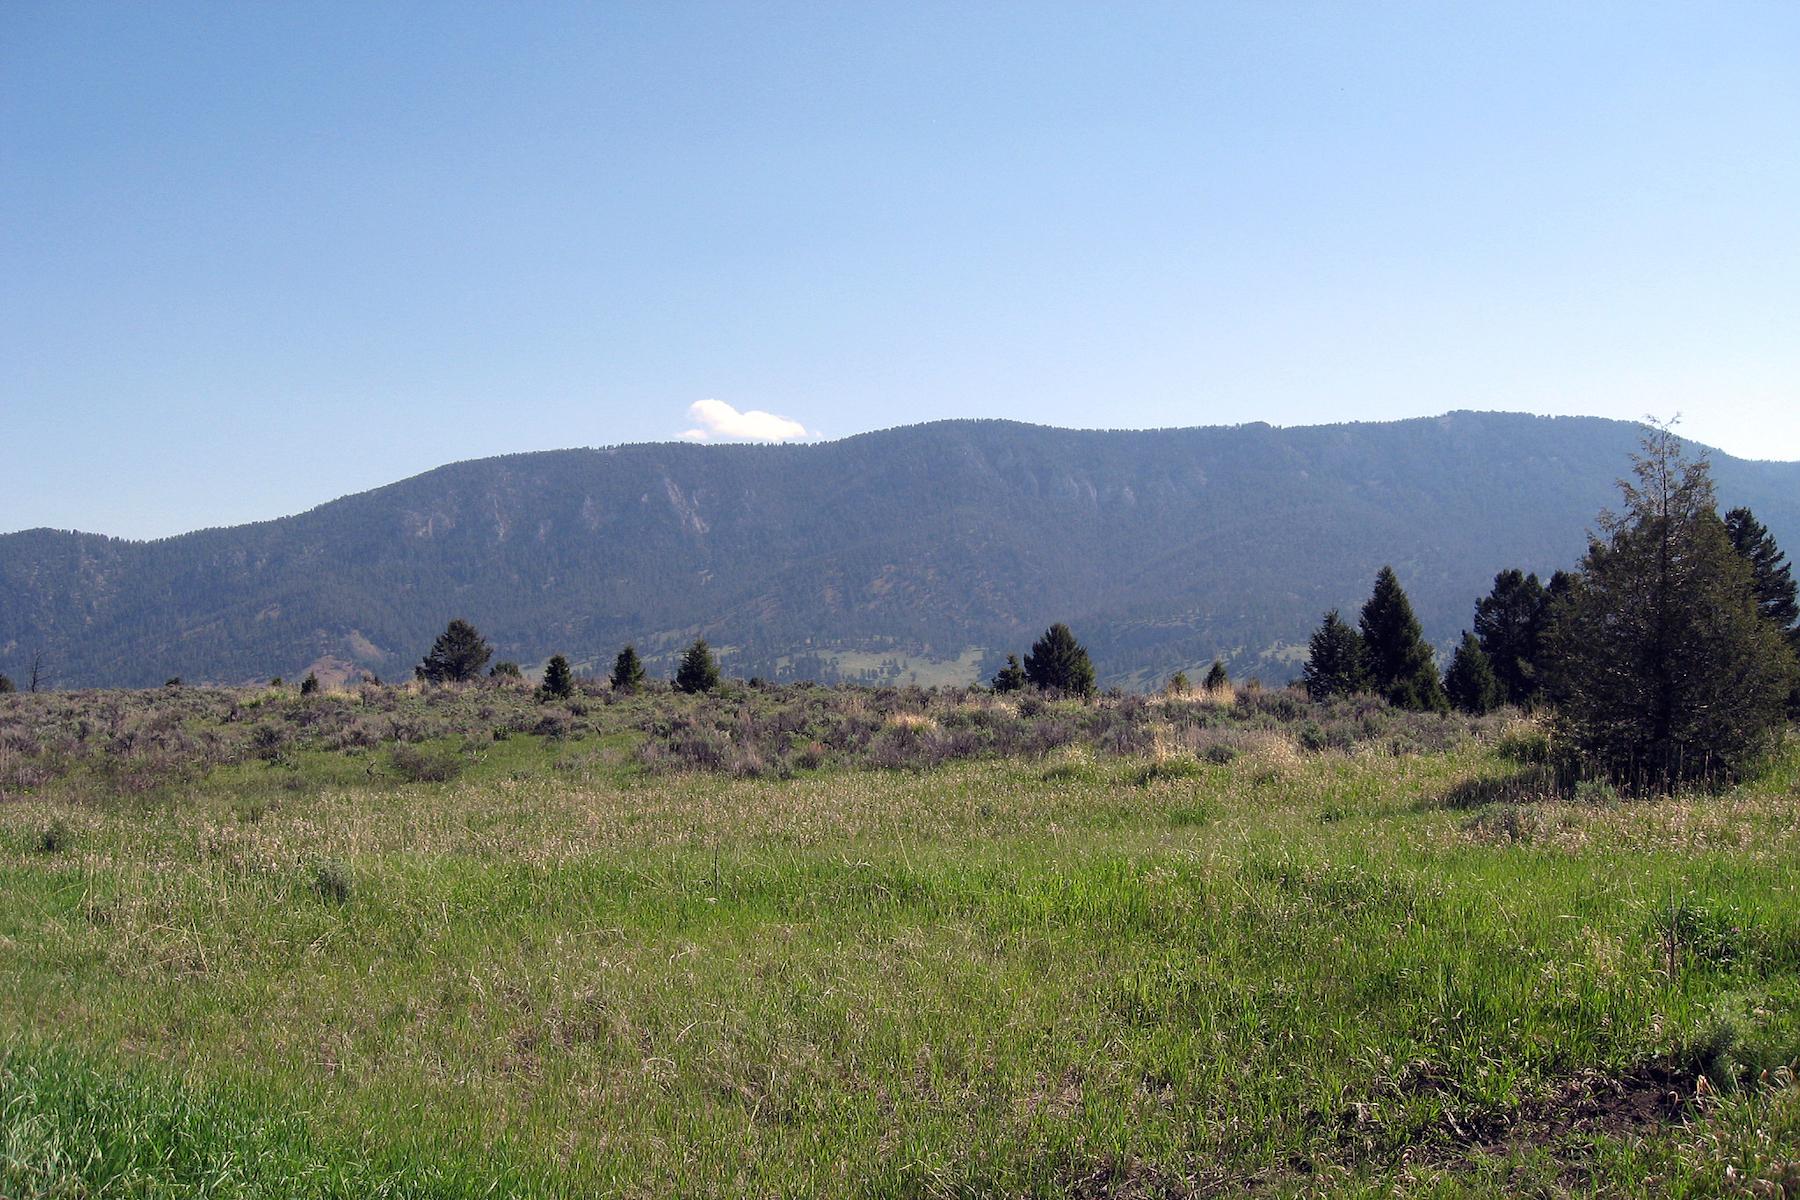 Terreno por un Venta en Porcupine Park Homesite Talus Trail, Porcupine Park Lot 35 Big Sky, Montana, 59716 Estados Unidos